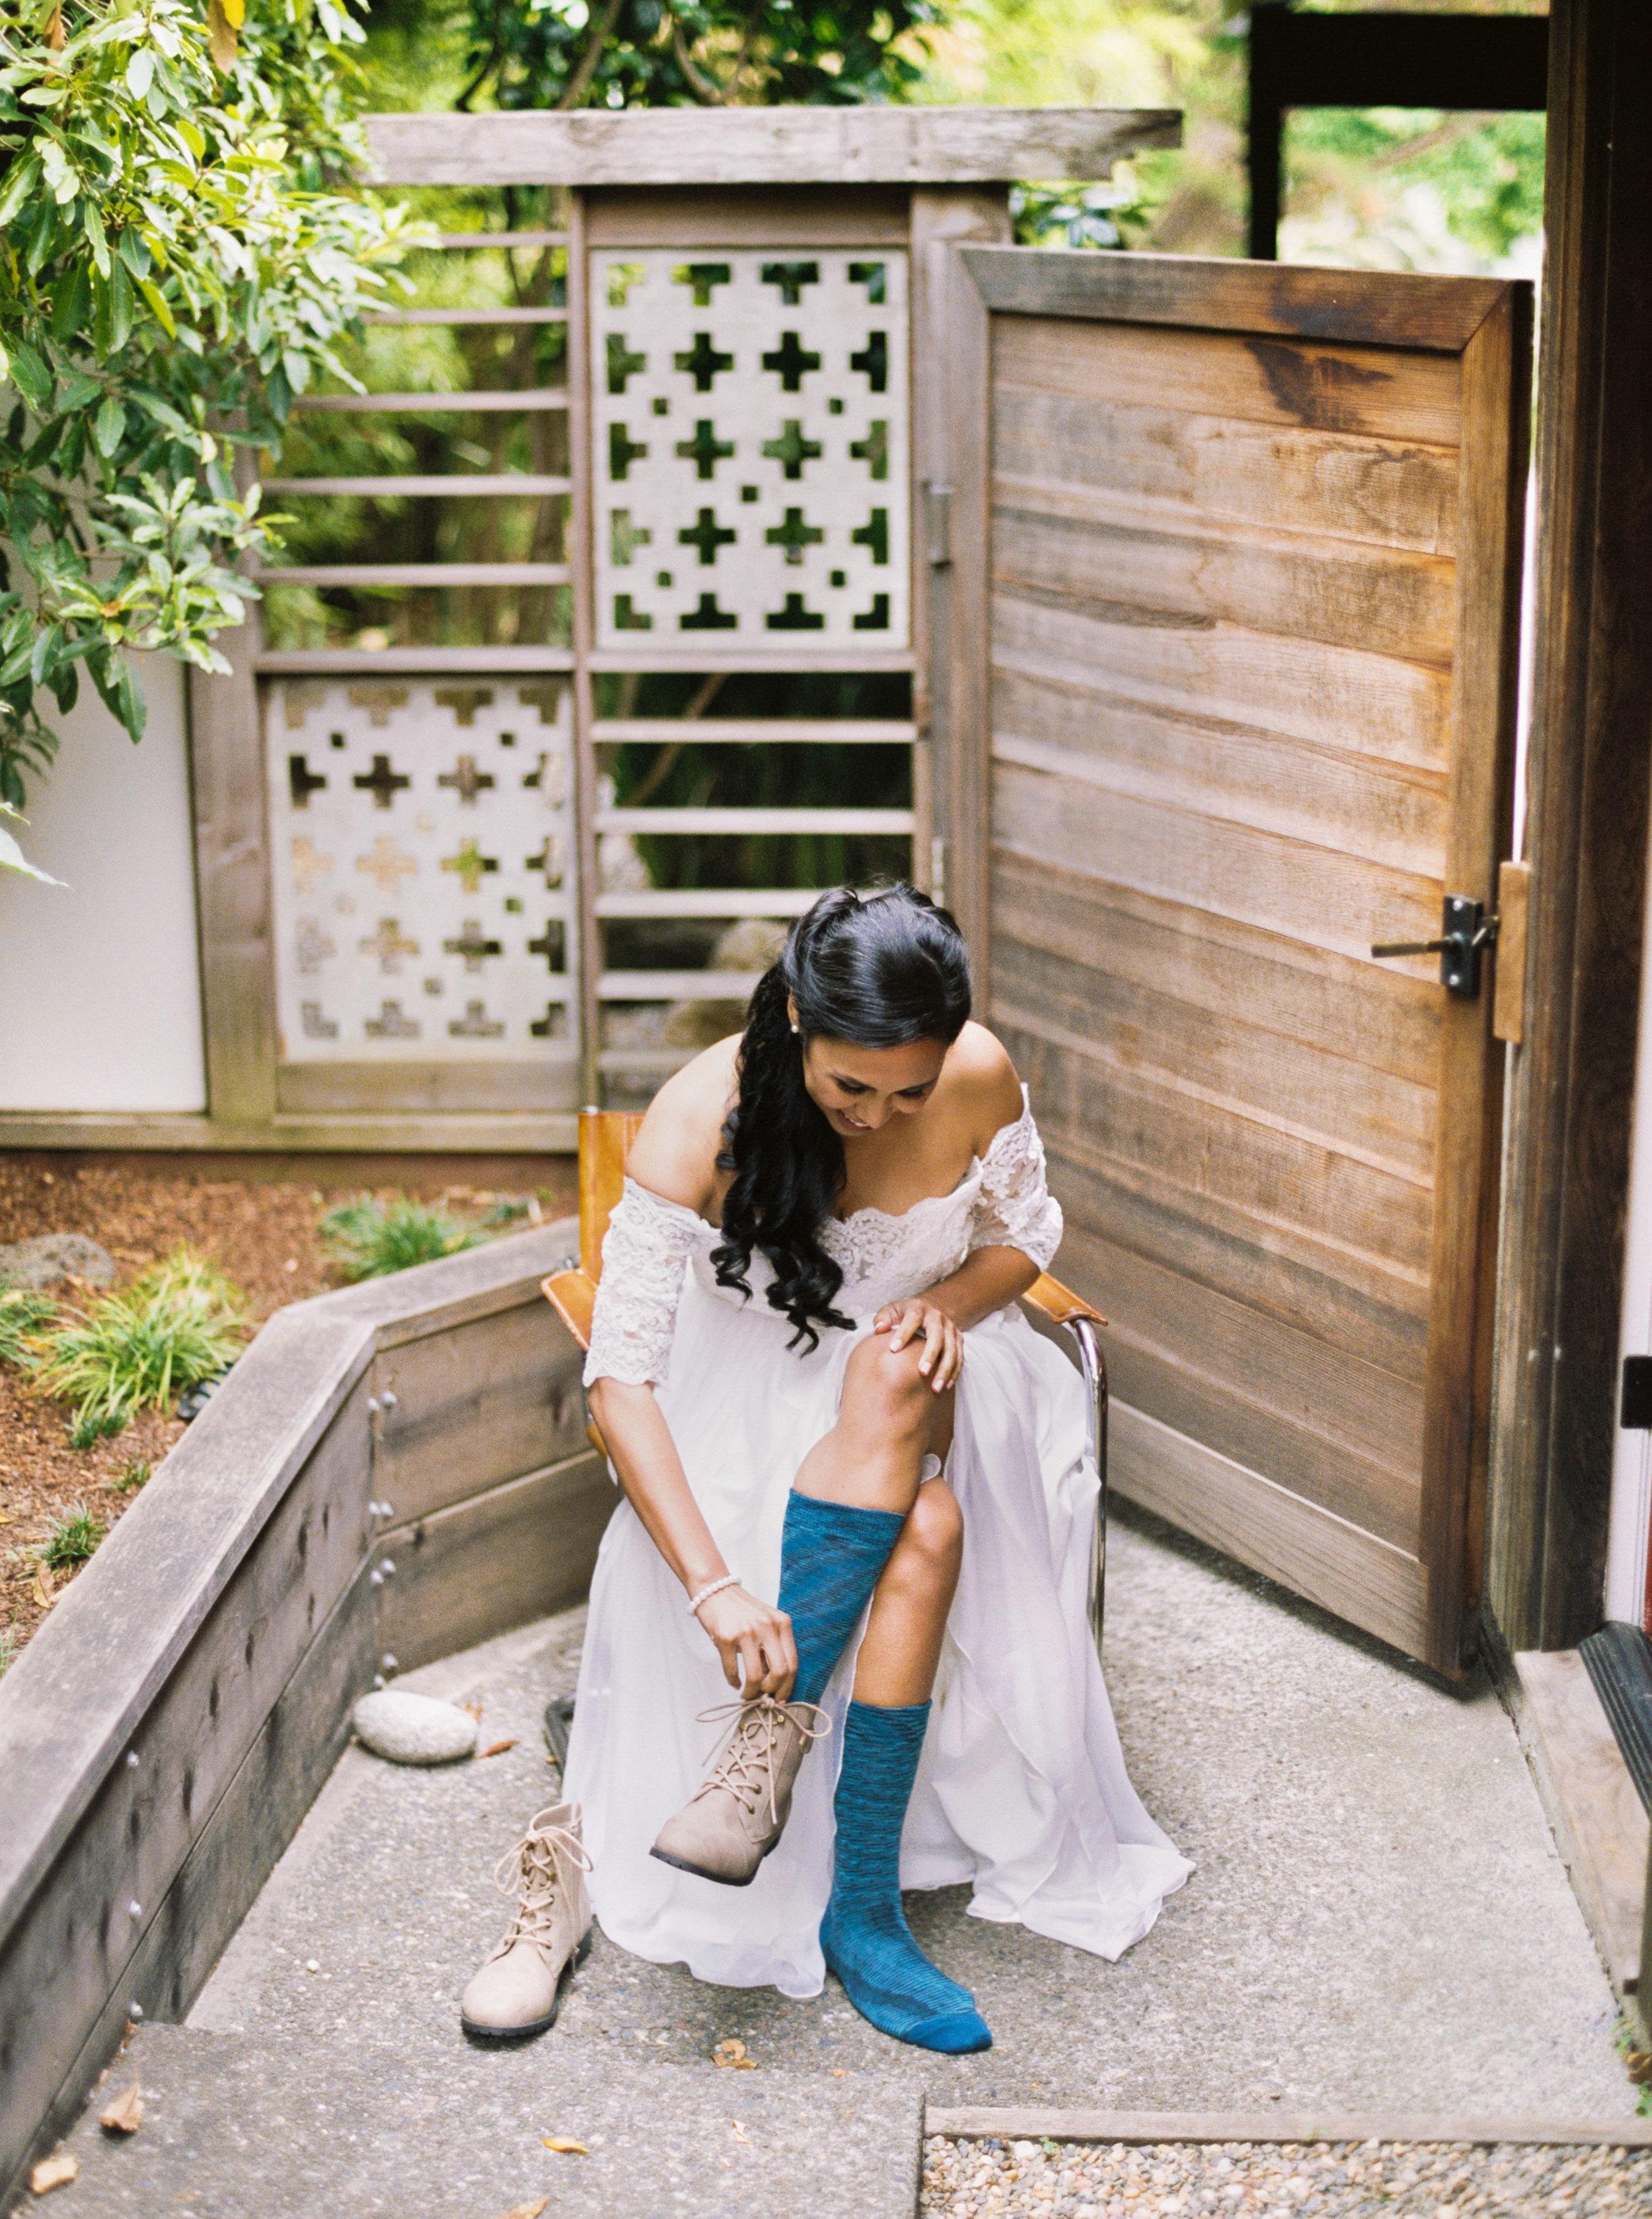 017_Krysten-Crebin-Bay-Area-Elopement-Wedding-Photographer-Videographer.jpg